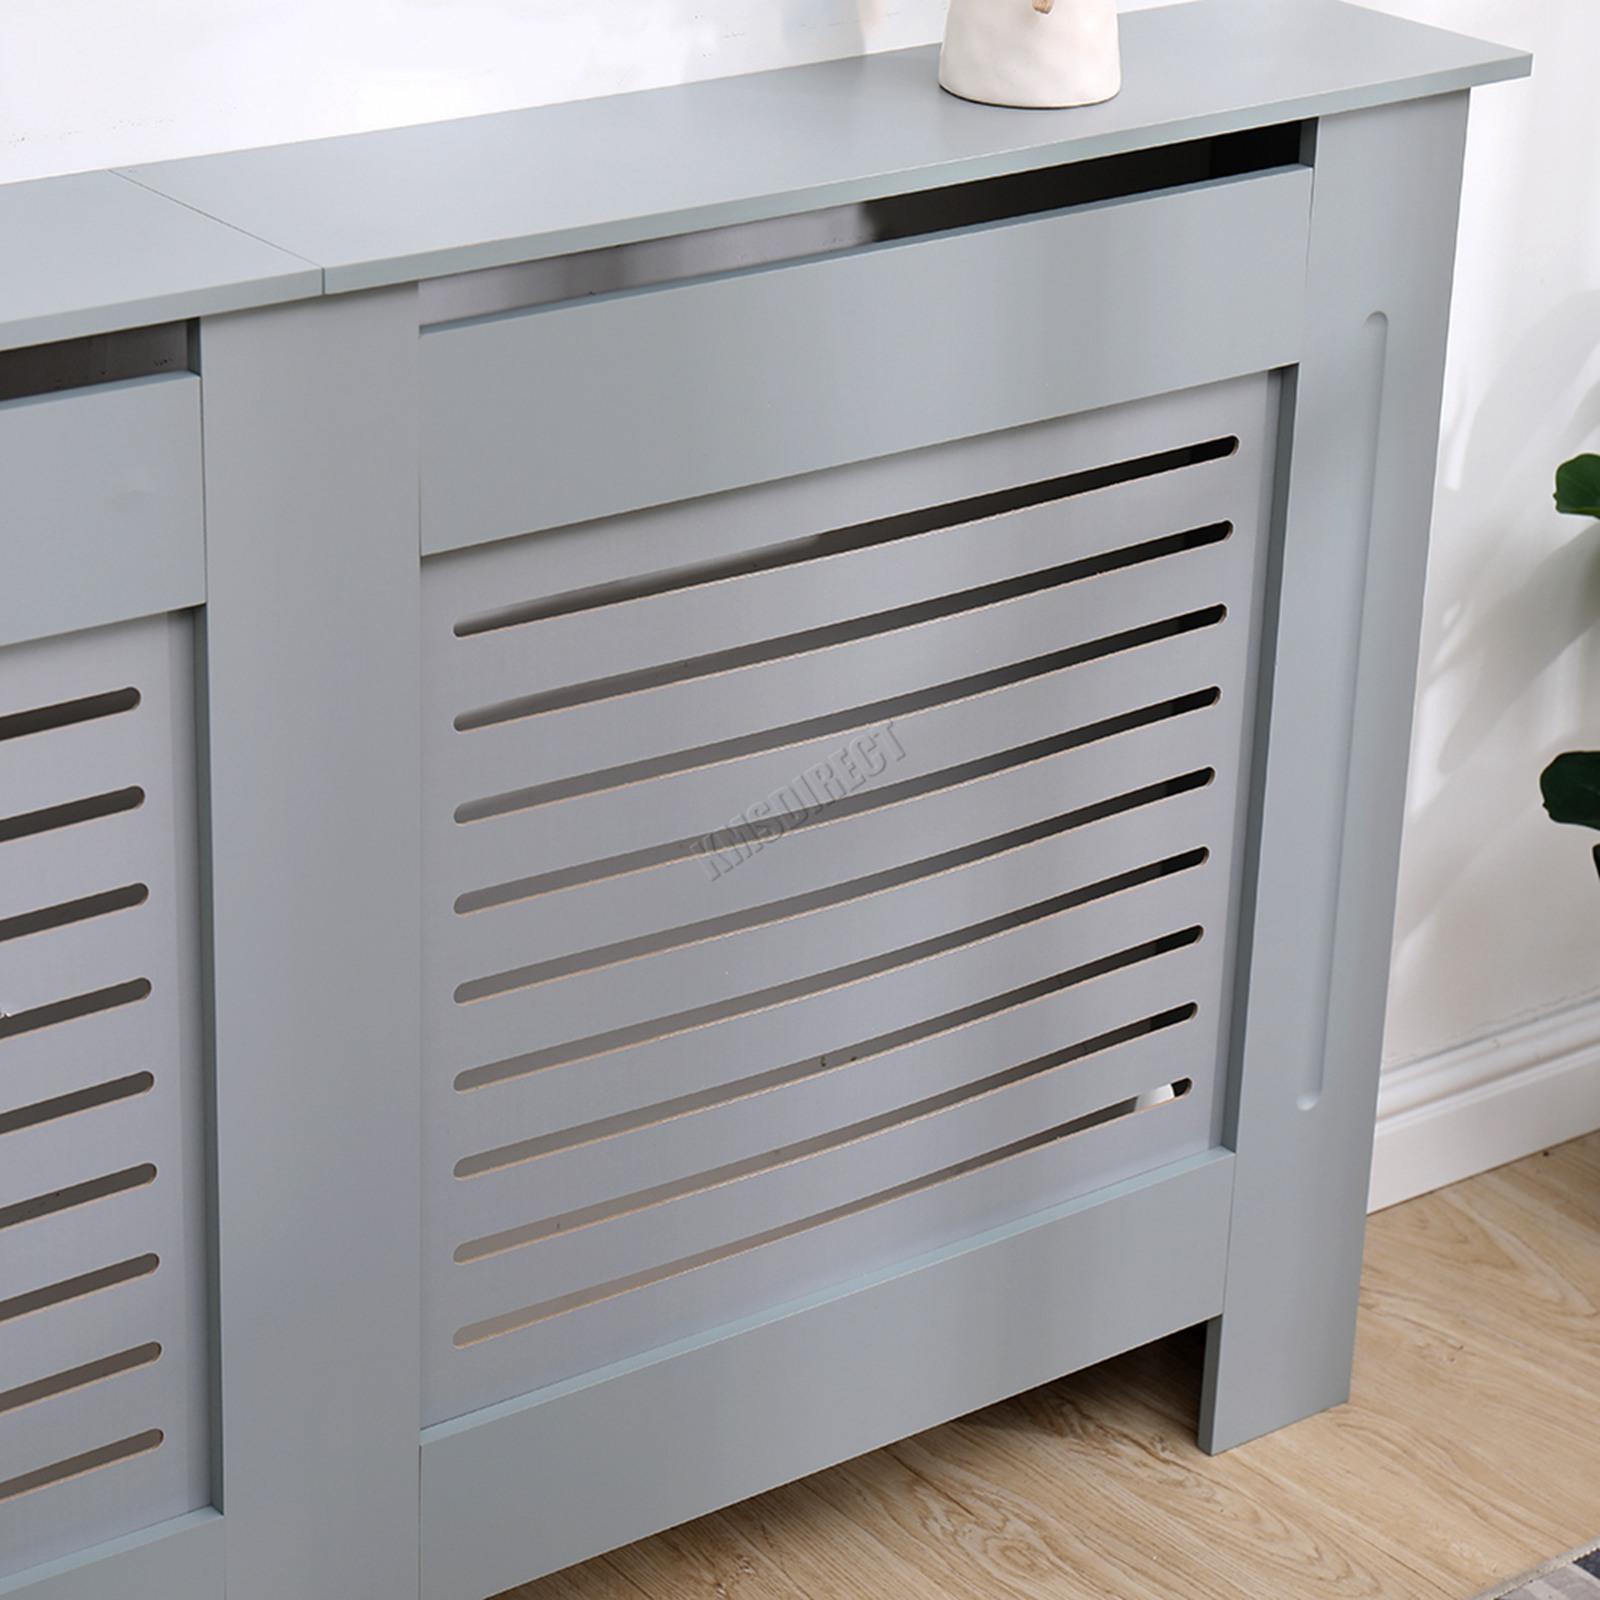 Westwood Radiator Cover White Or Grey Wooden Radiator Wall Shelves Cabinet Ebay